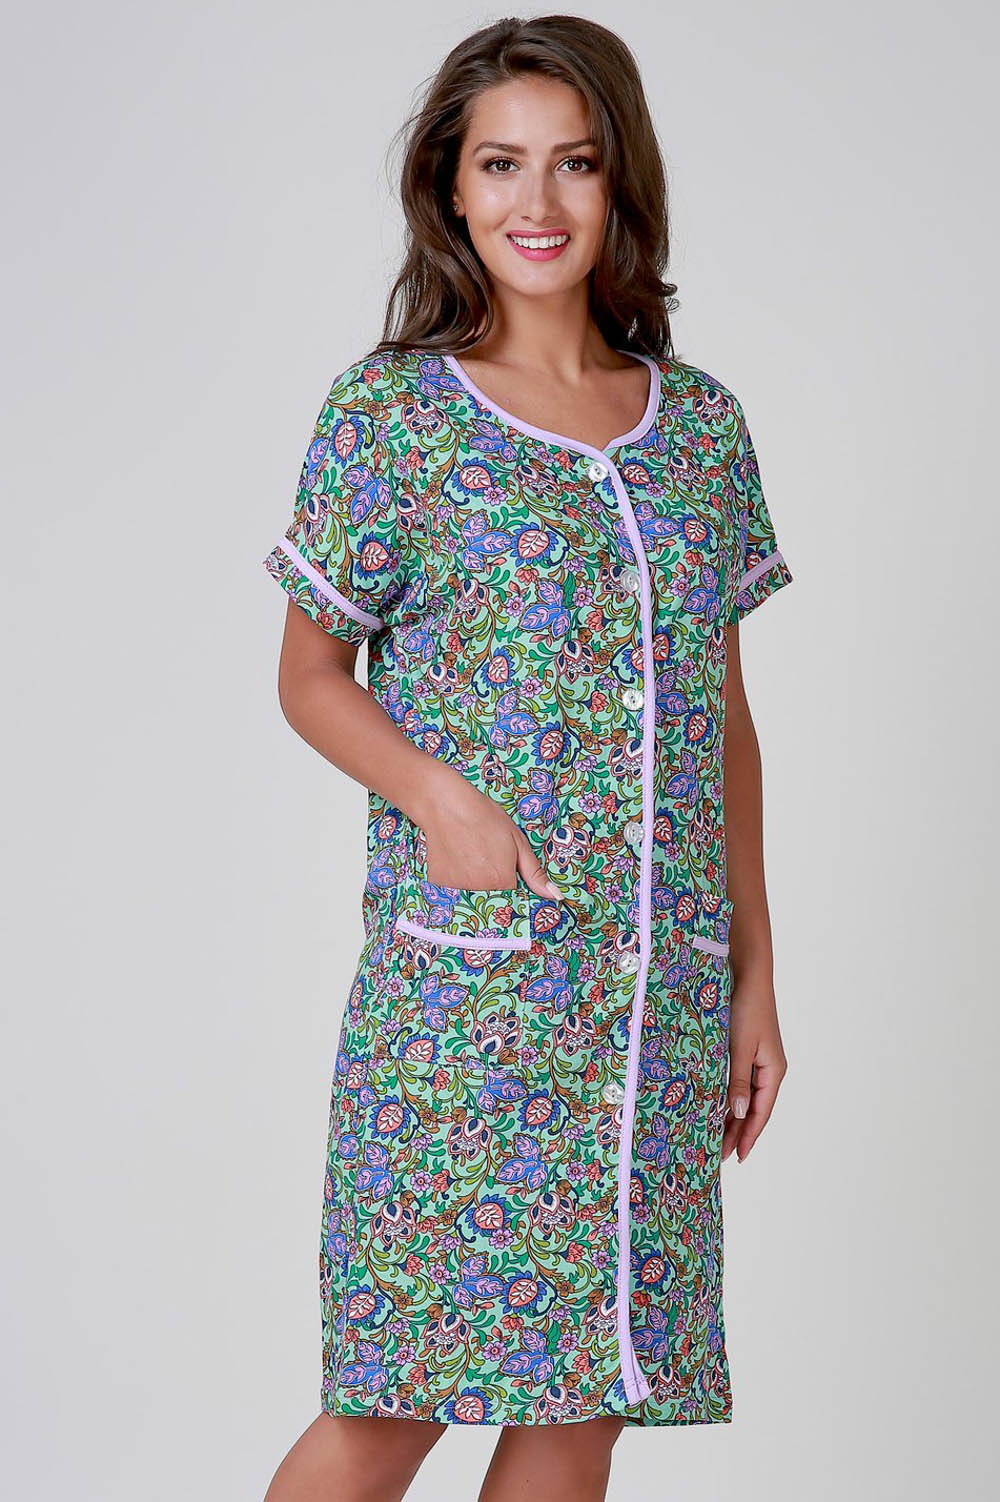 Домашние халаты Pastilla Домашний халат Лаванда (xxL-xxxL) домашние халаты pastilla домашний халат муза цвет коралл xxl xxxl